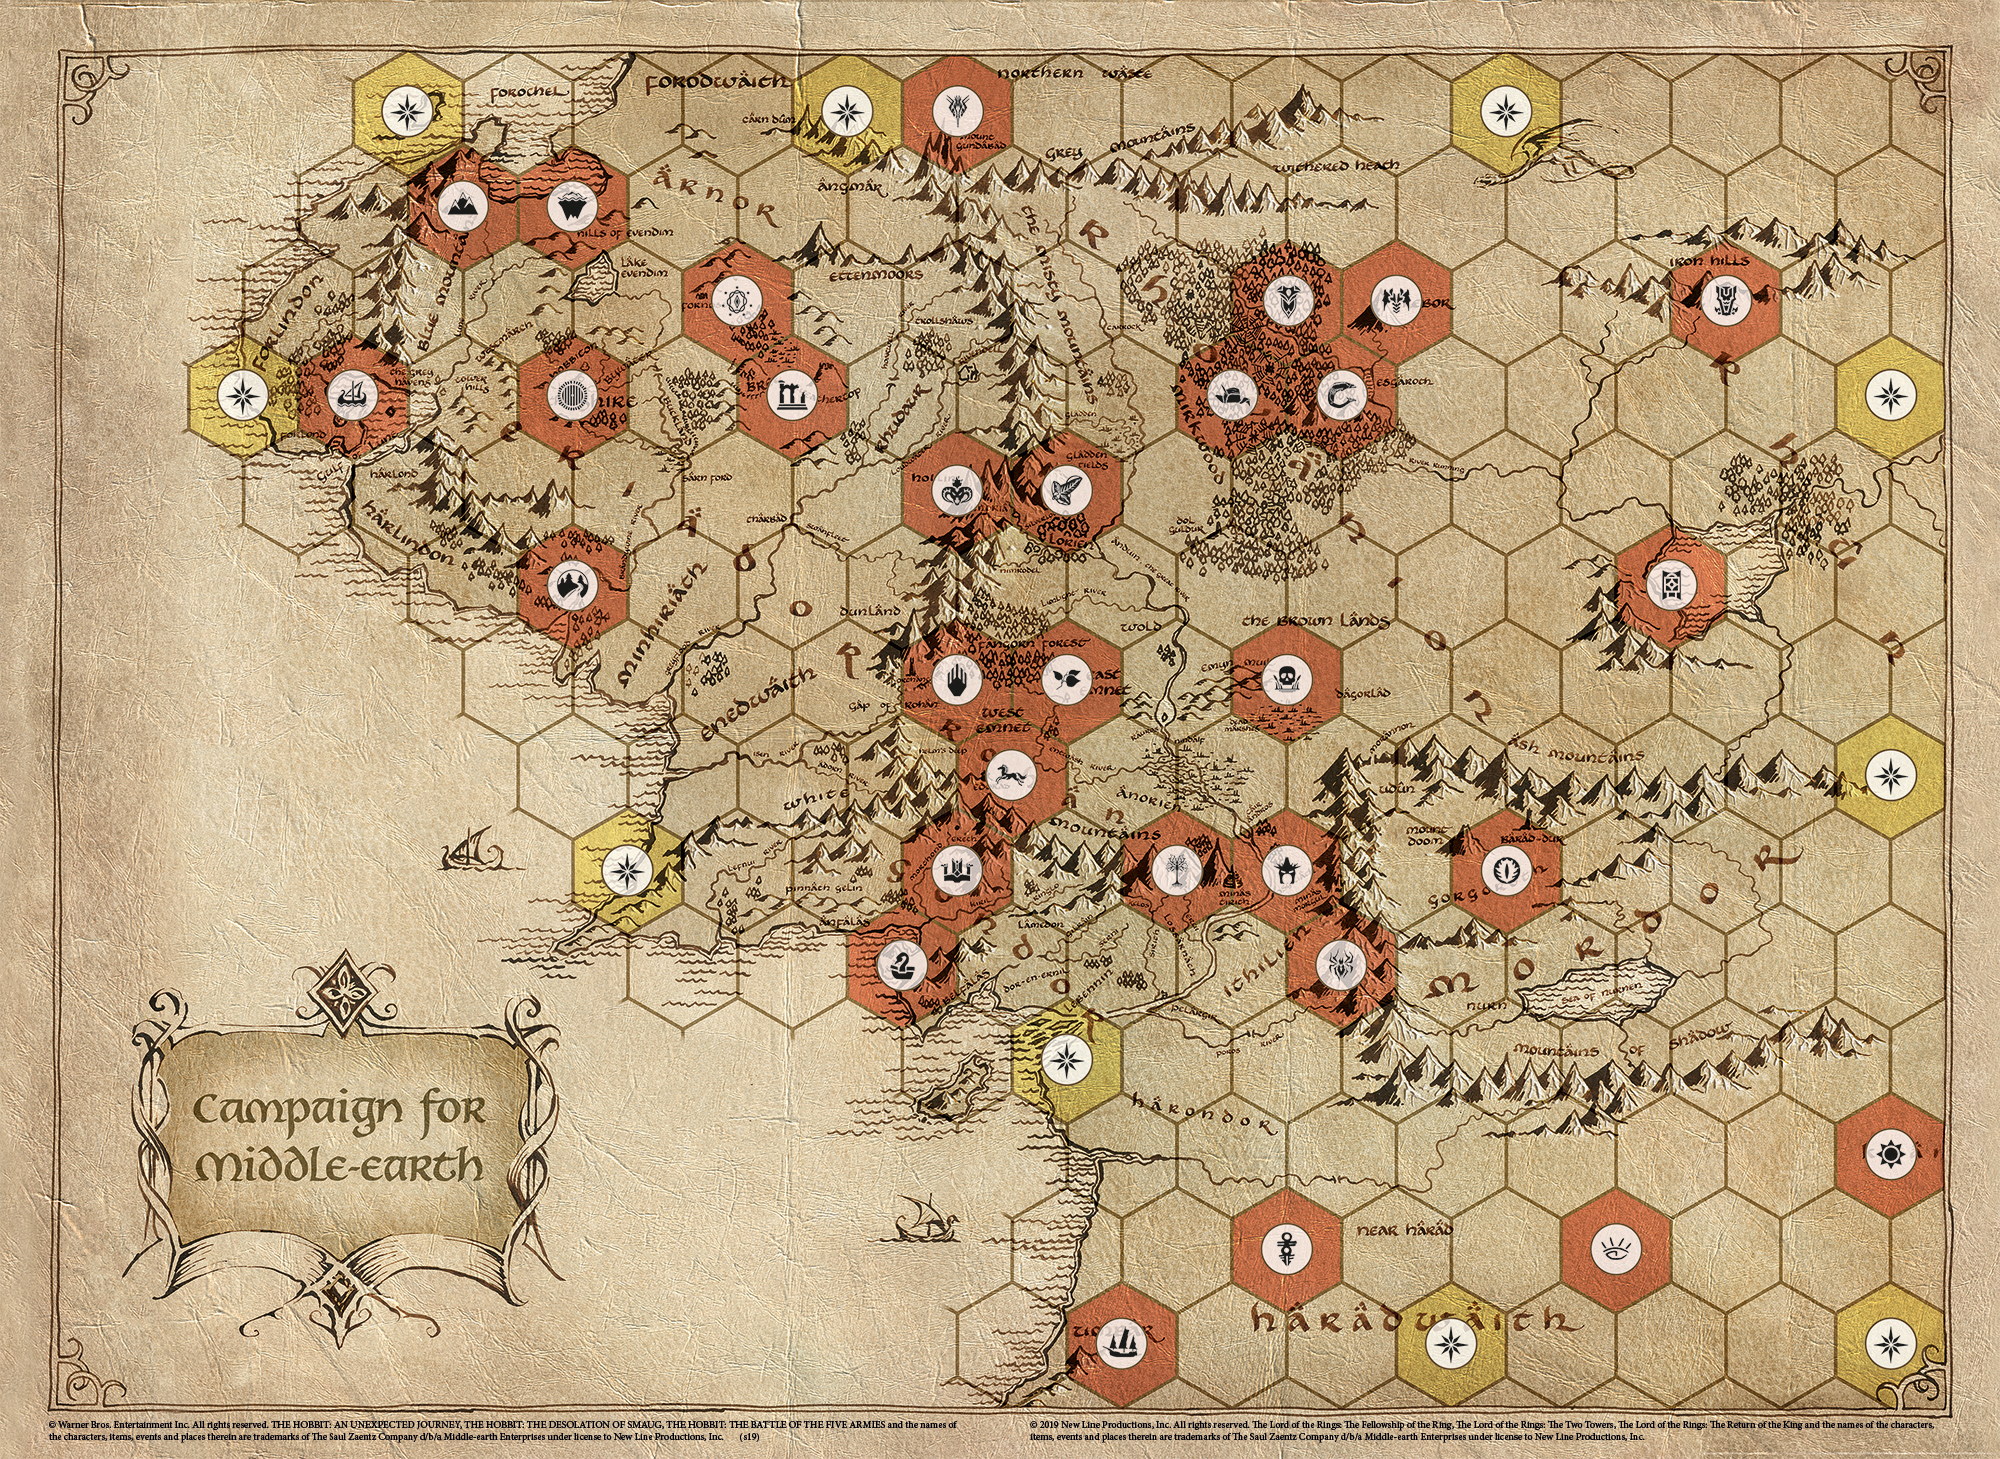 BattleCompanies_MapCampaign.jpg